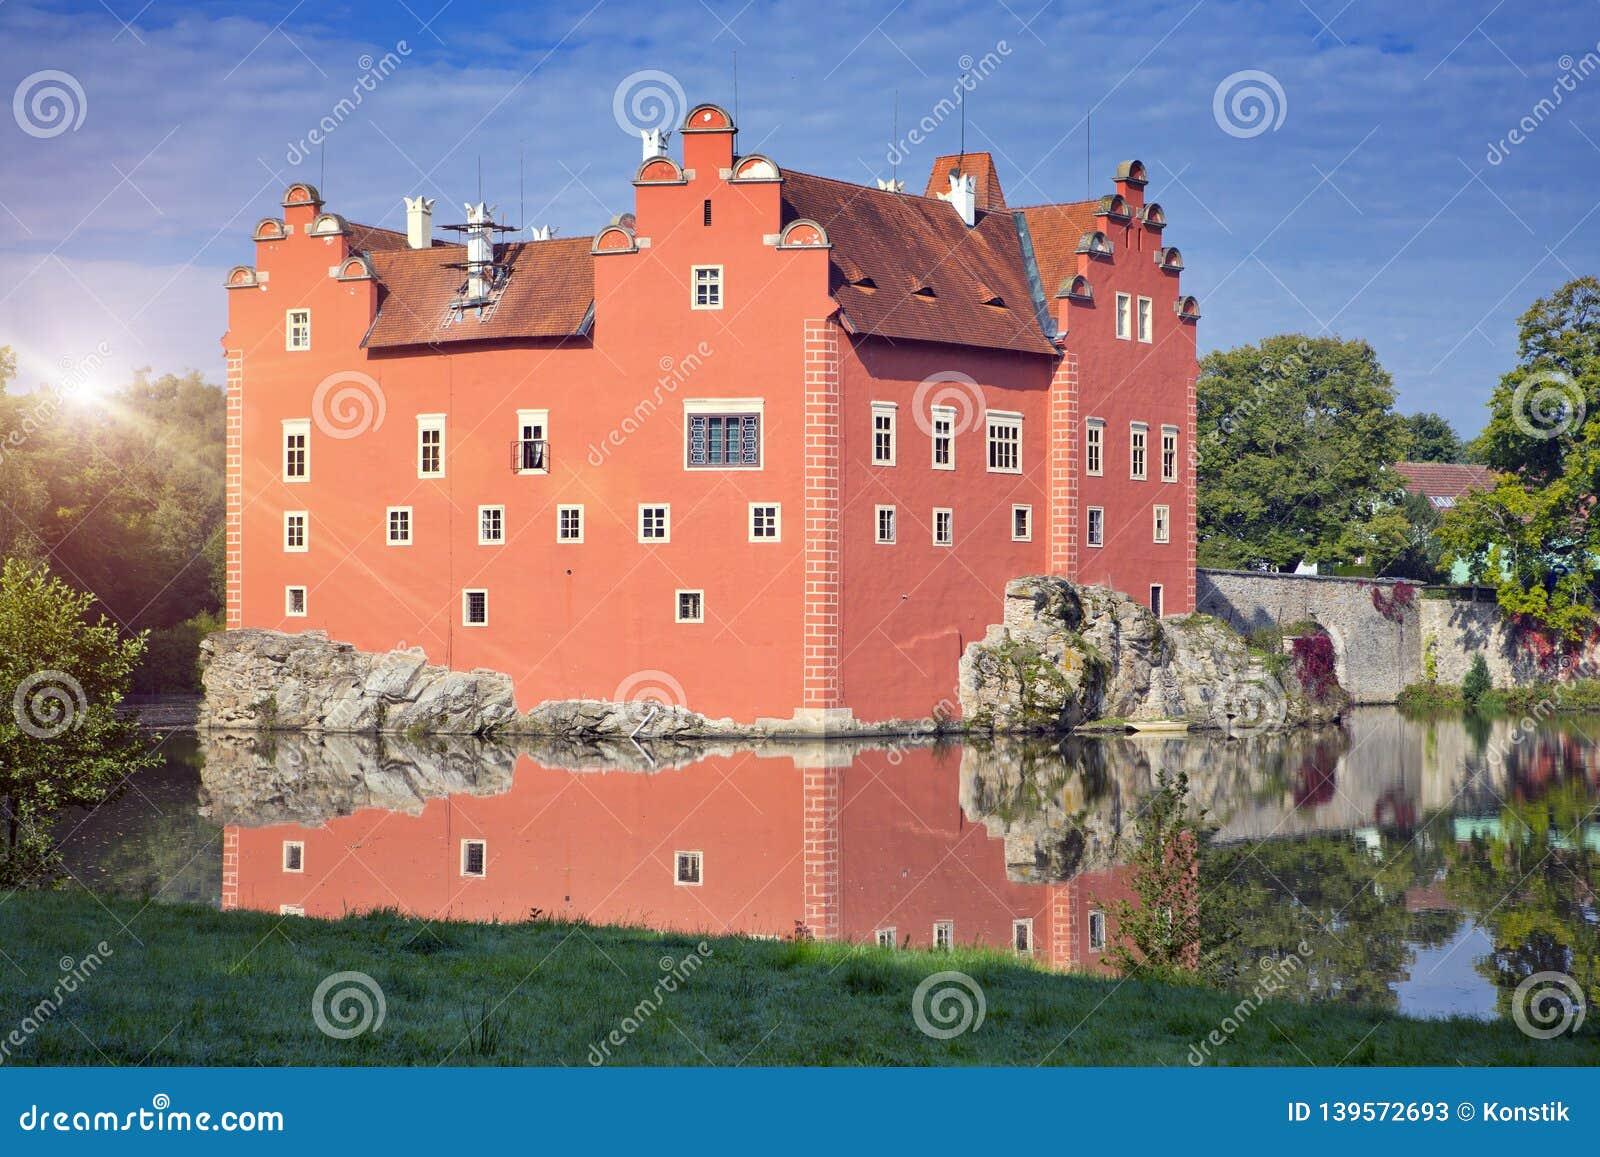 Cervena Lhota. Czech Republic. Castle on the lake